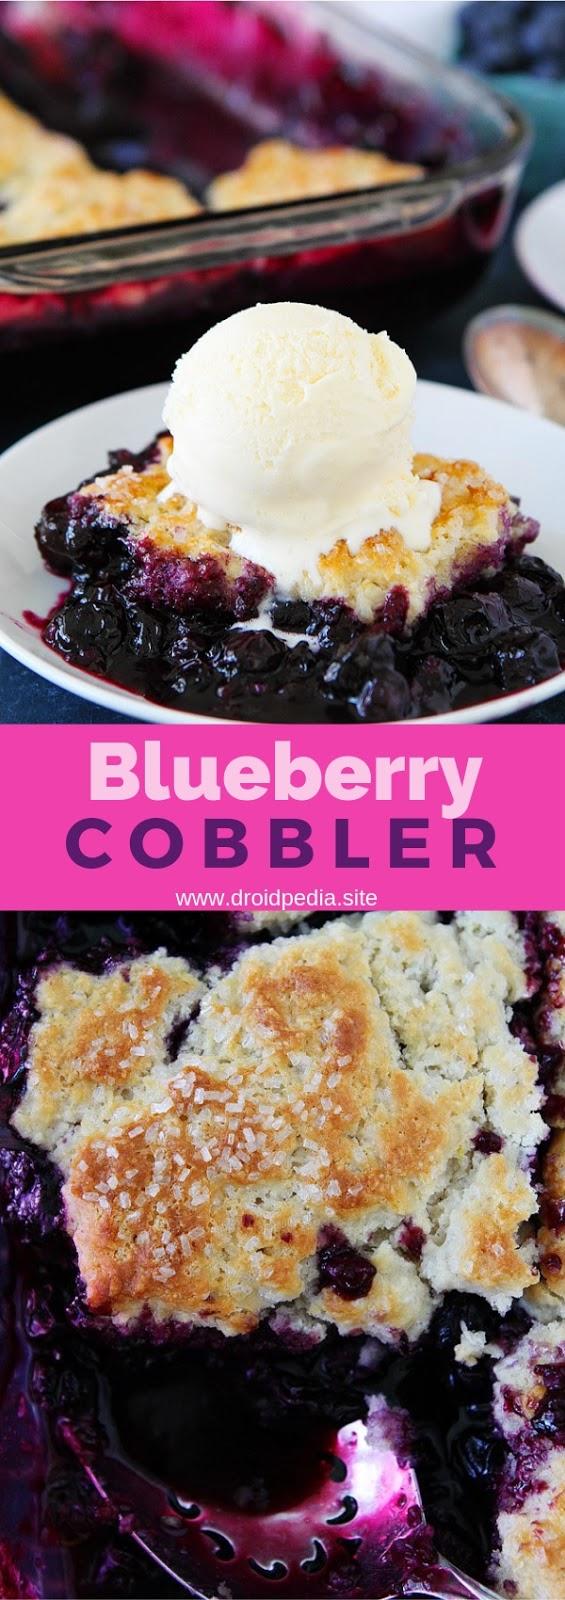 Blueberry Cobbler #dessert #blueberry #cobbler